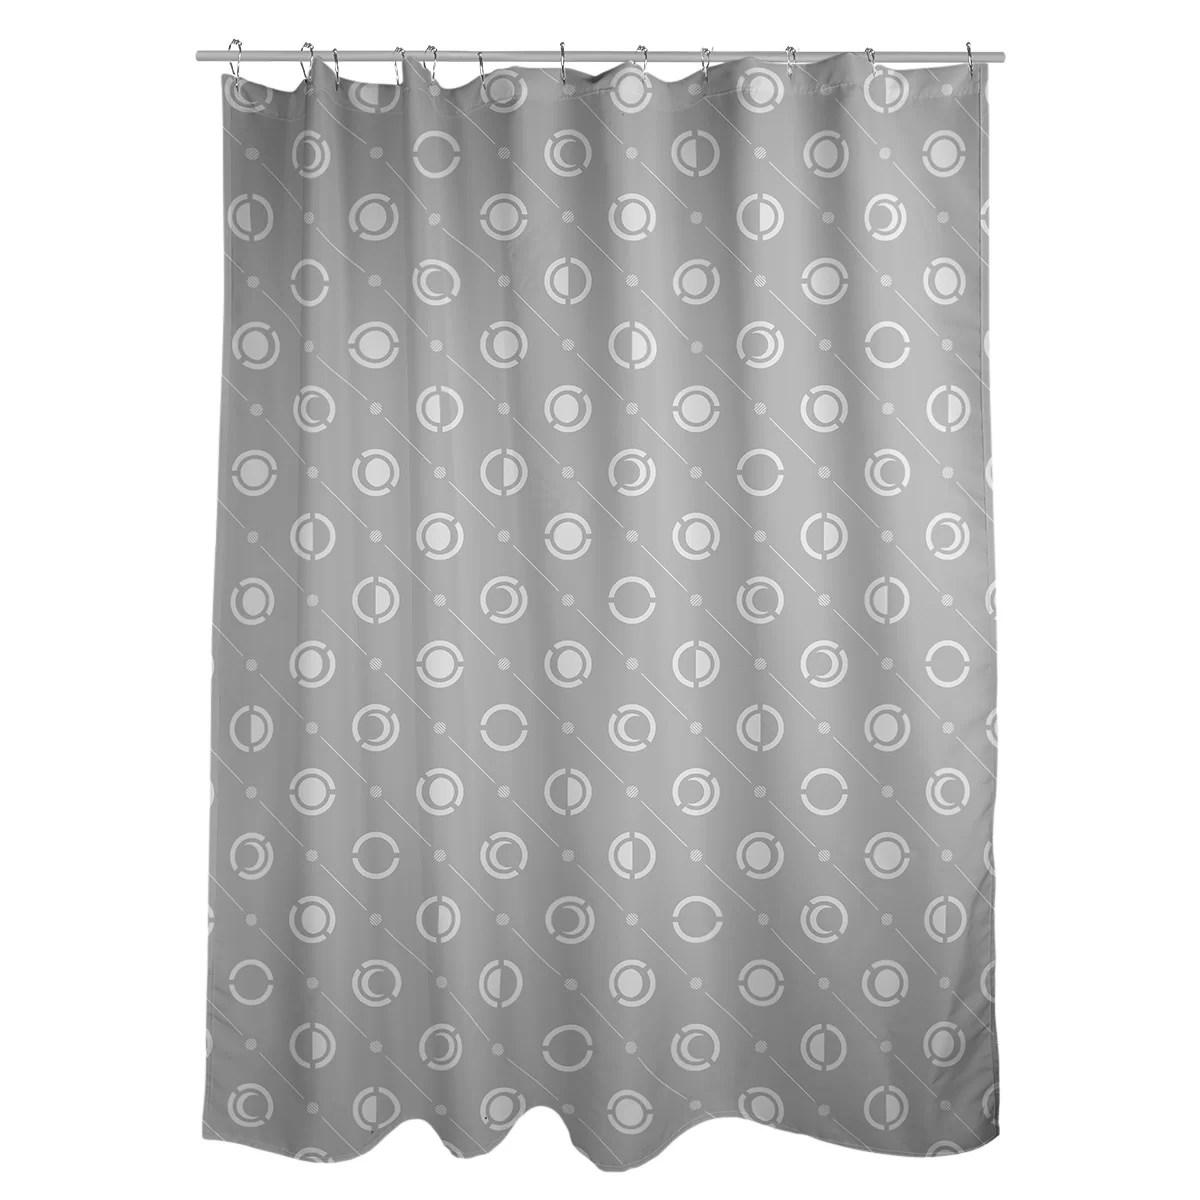 noira gothard classic moon phases single shower curtain